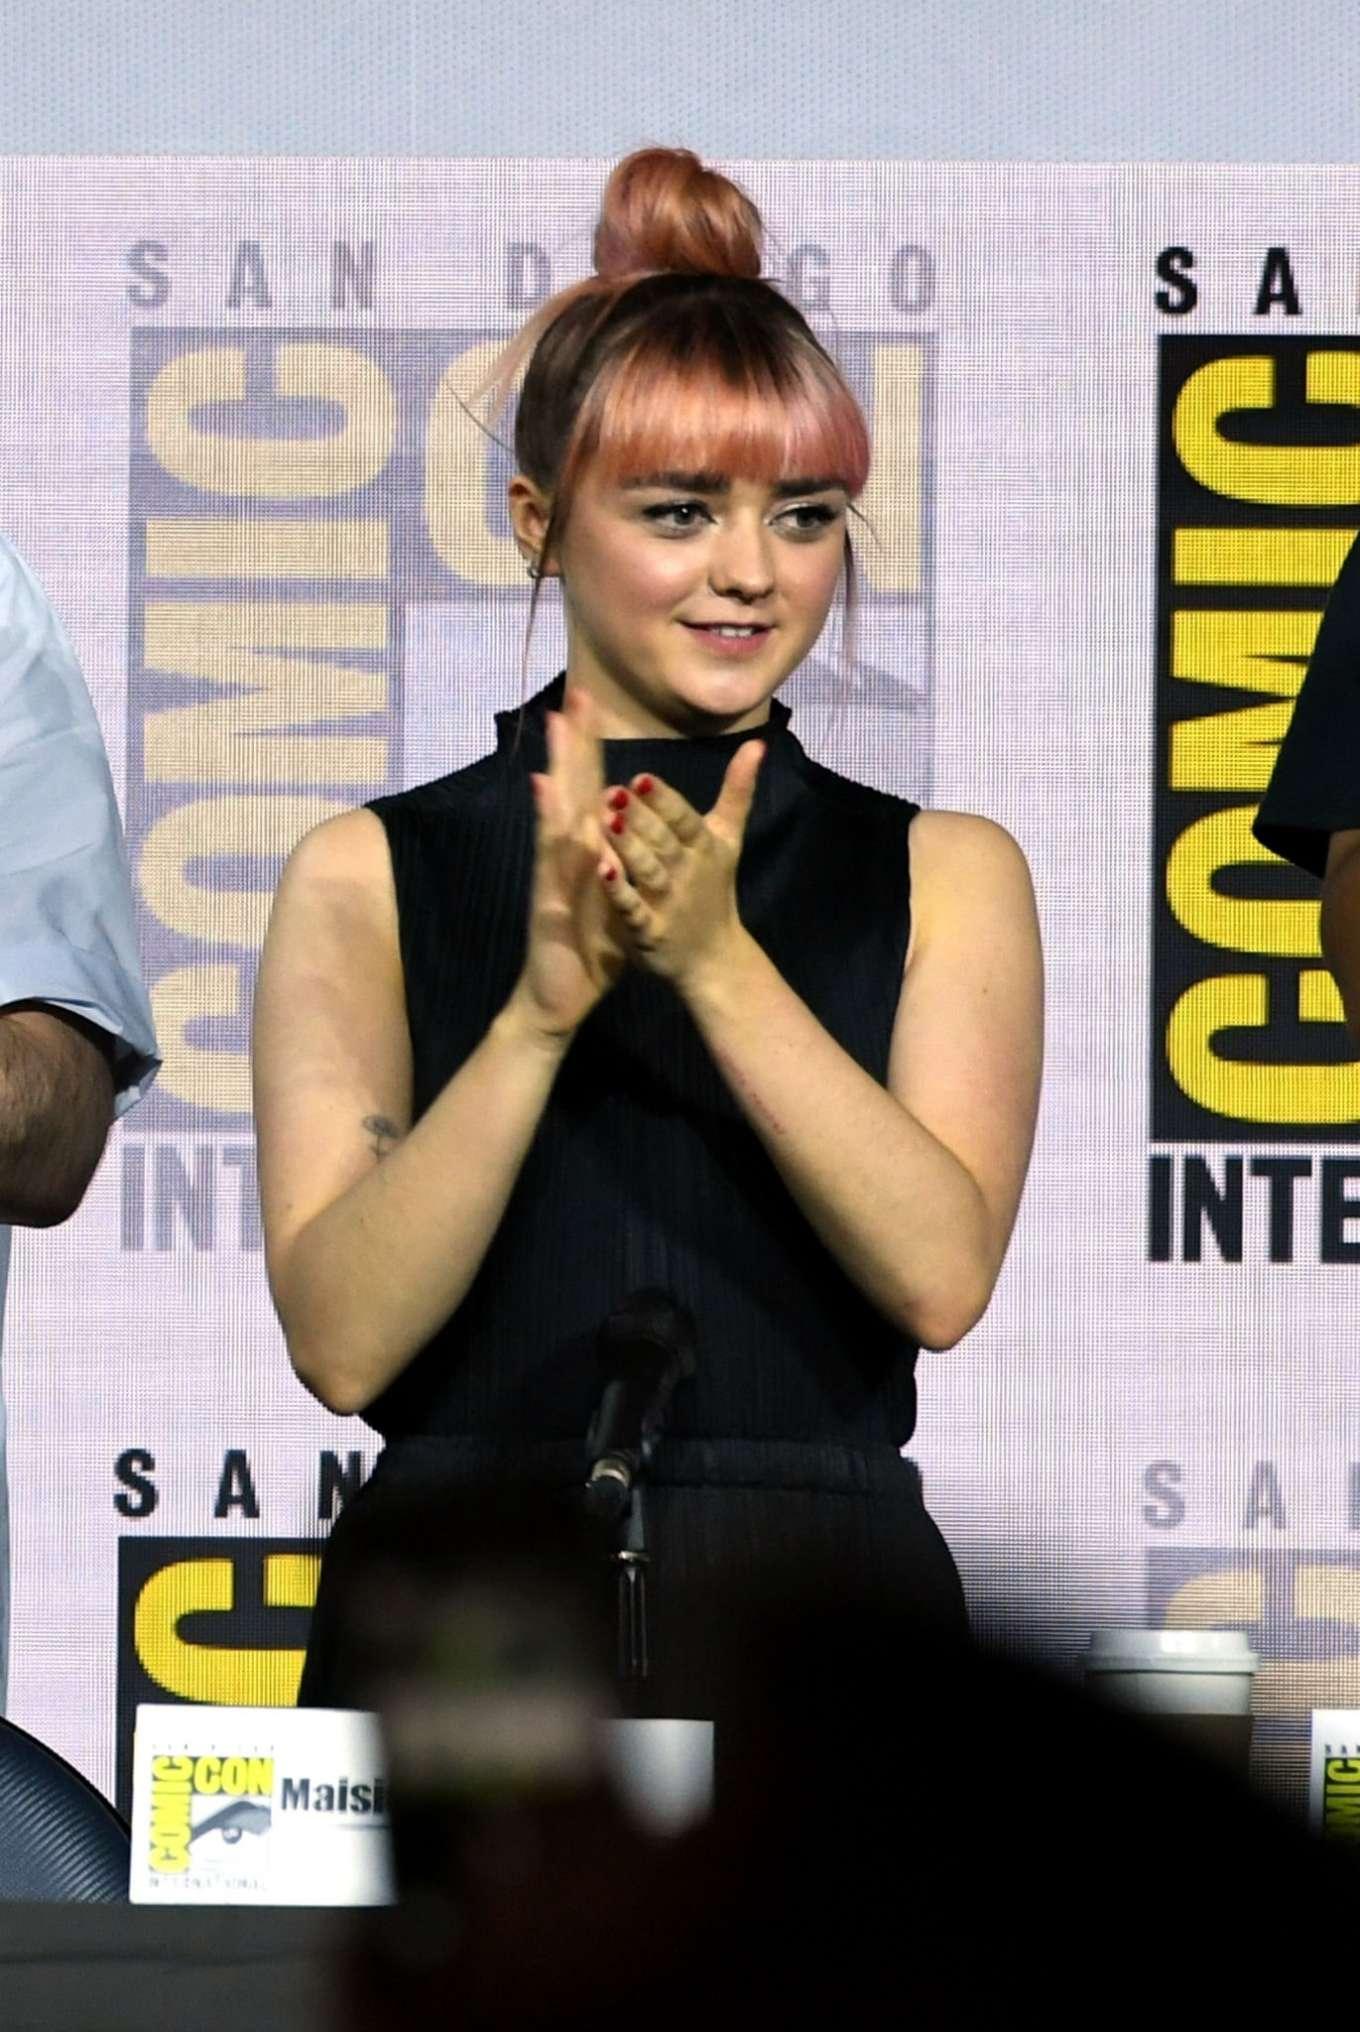 Maisie Williams 2019 : Maisie Williams – Game of Thrones Panel at Comic Con San Diego 2019-21